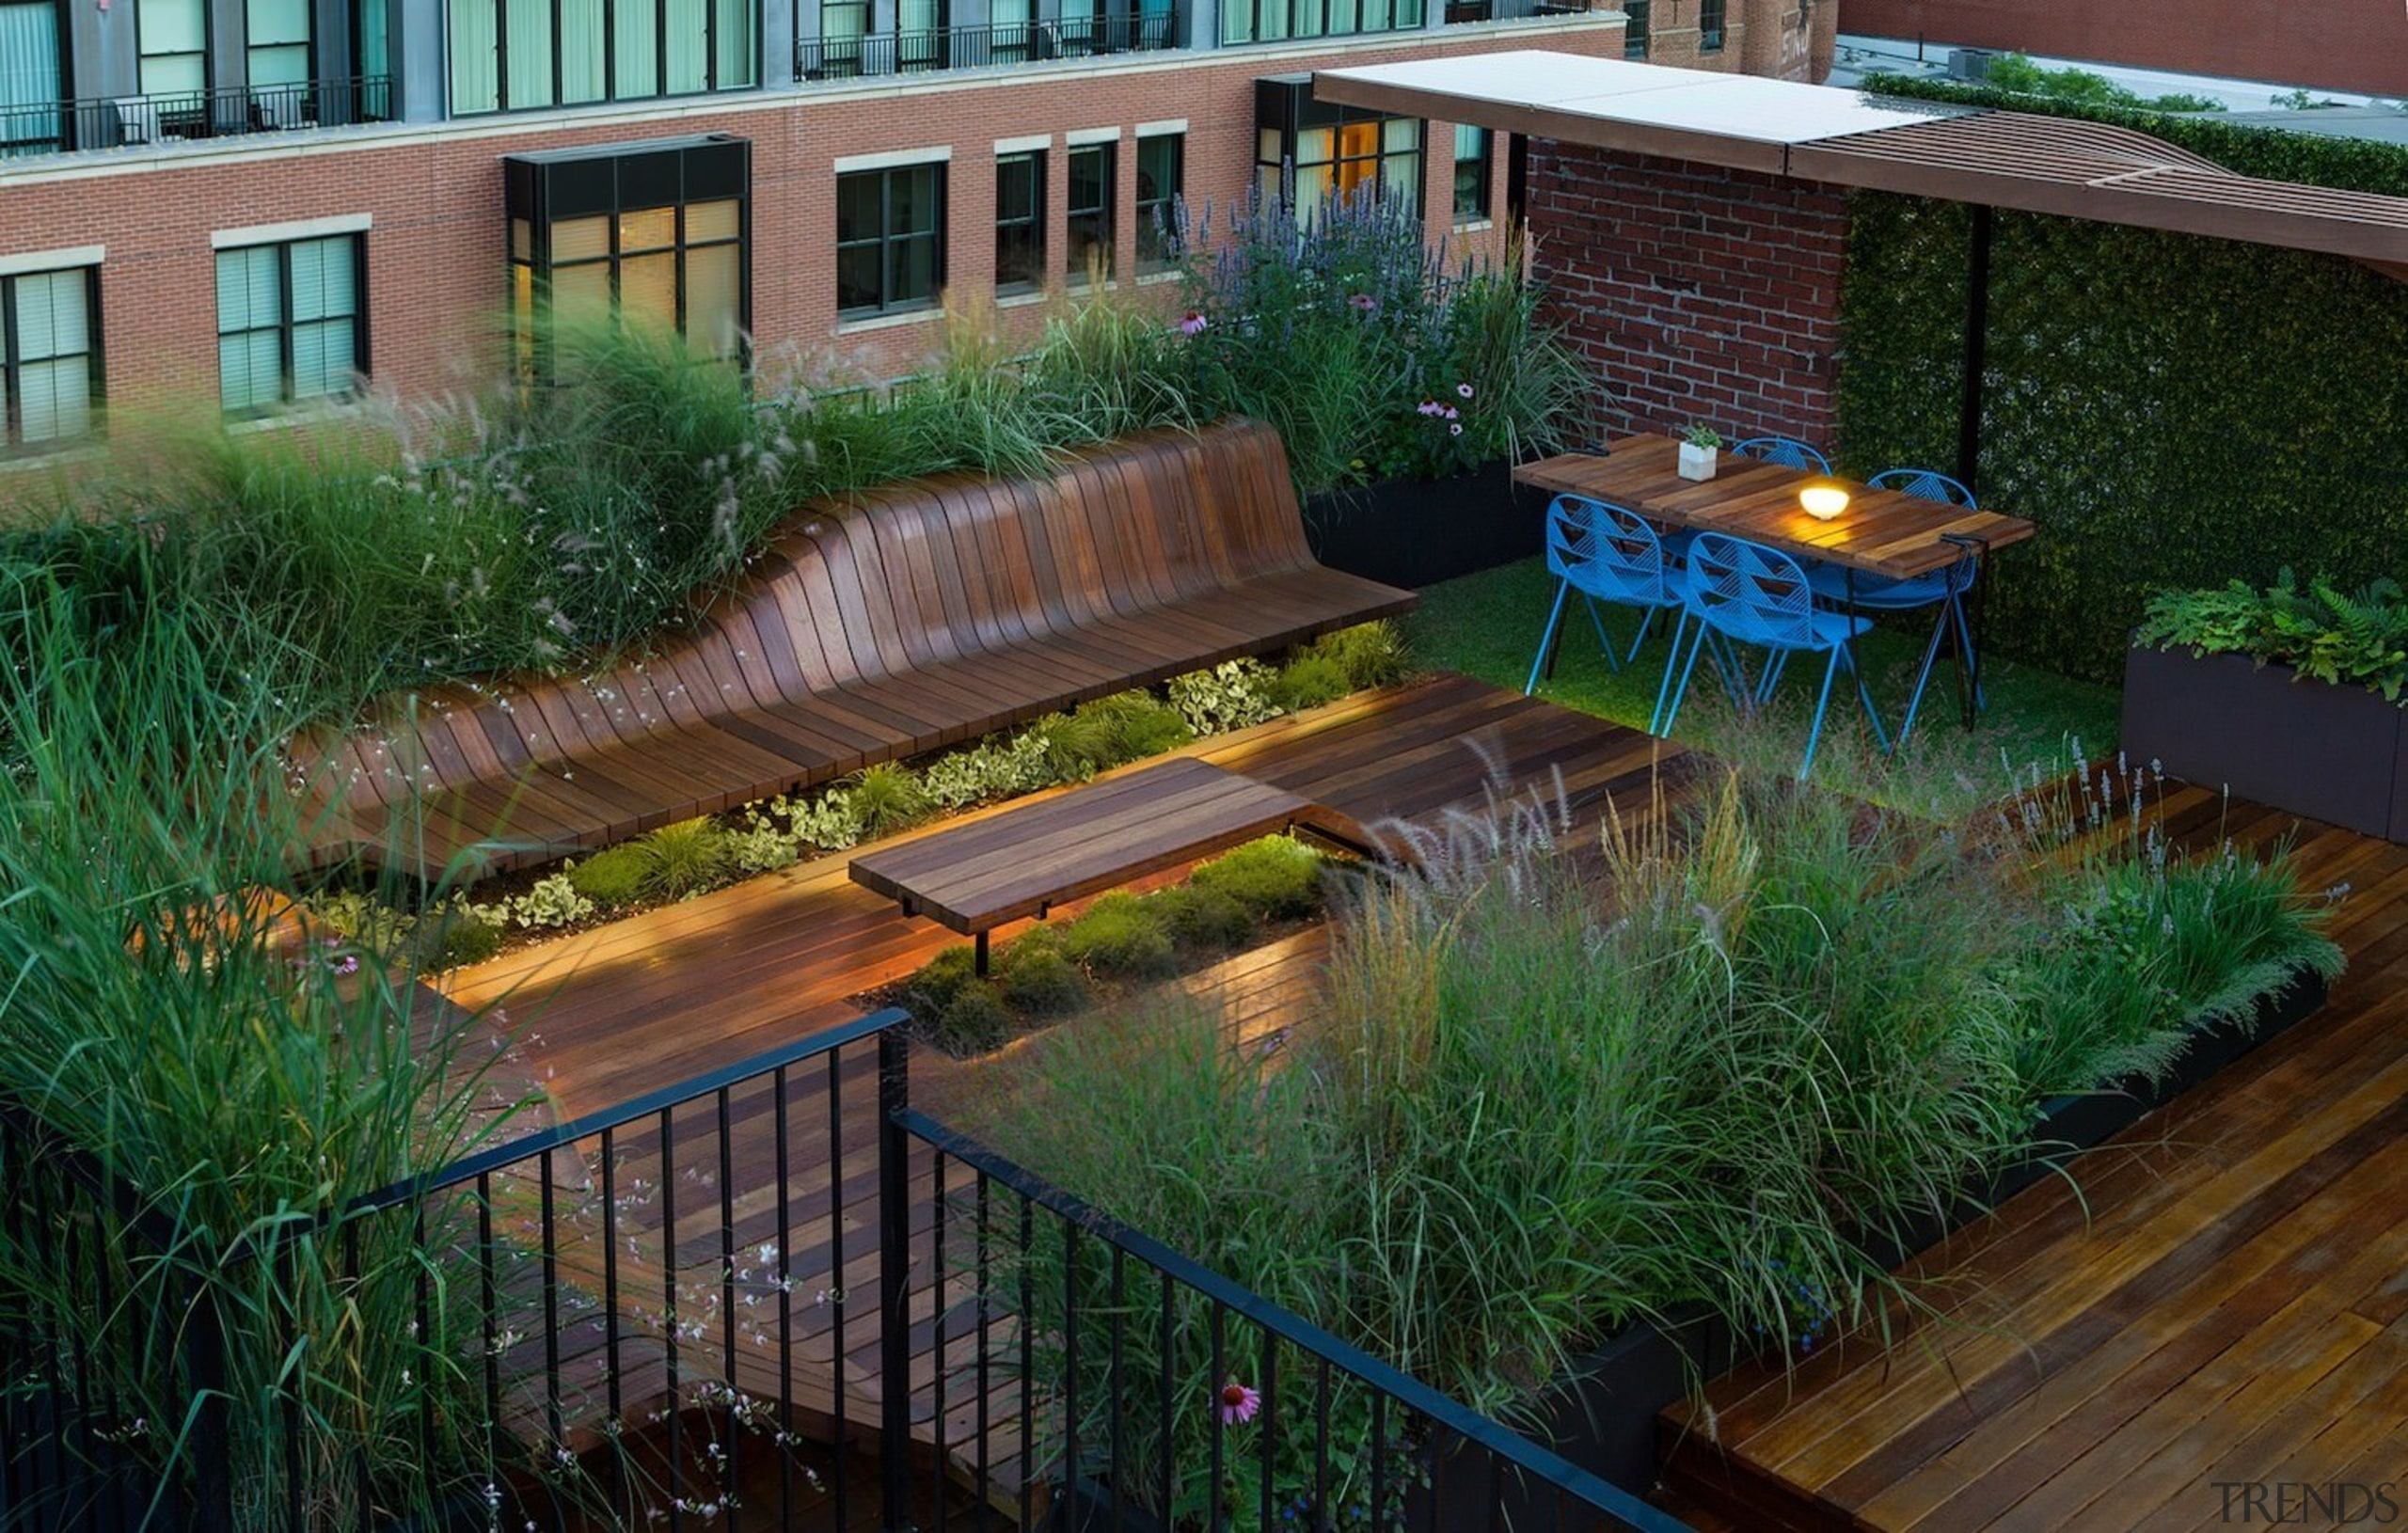 Architect: J.Roc Design backyard, courtyard, garden, grass, landscape, landscaping, lighting, outdoor structure, plant, pond, walkway, water, yard, green, black